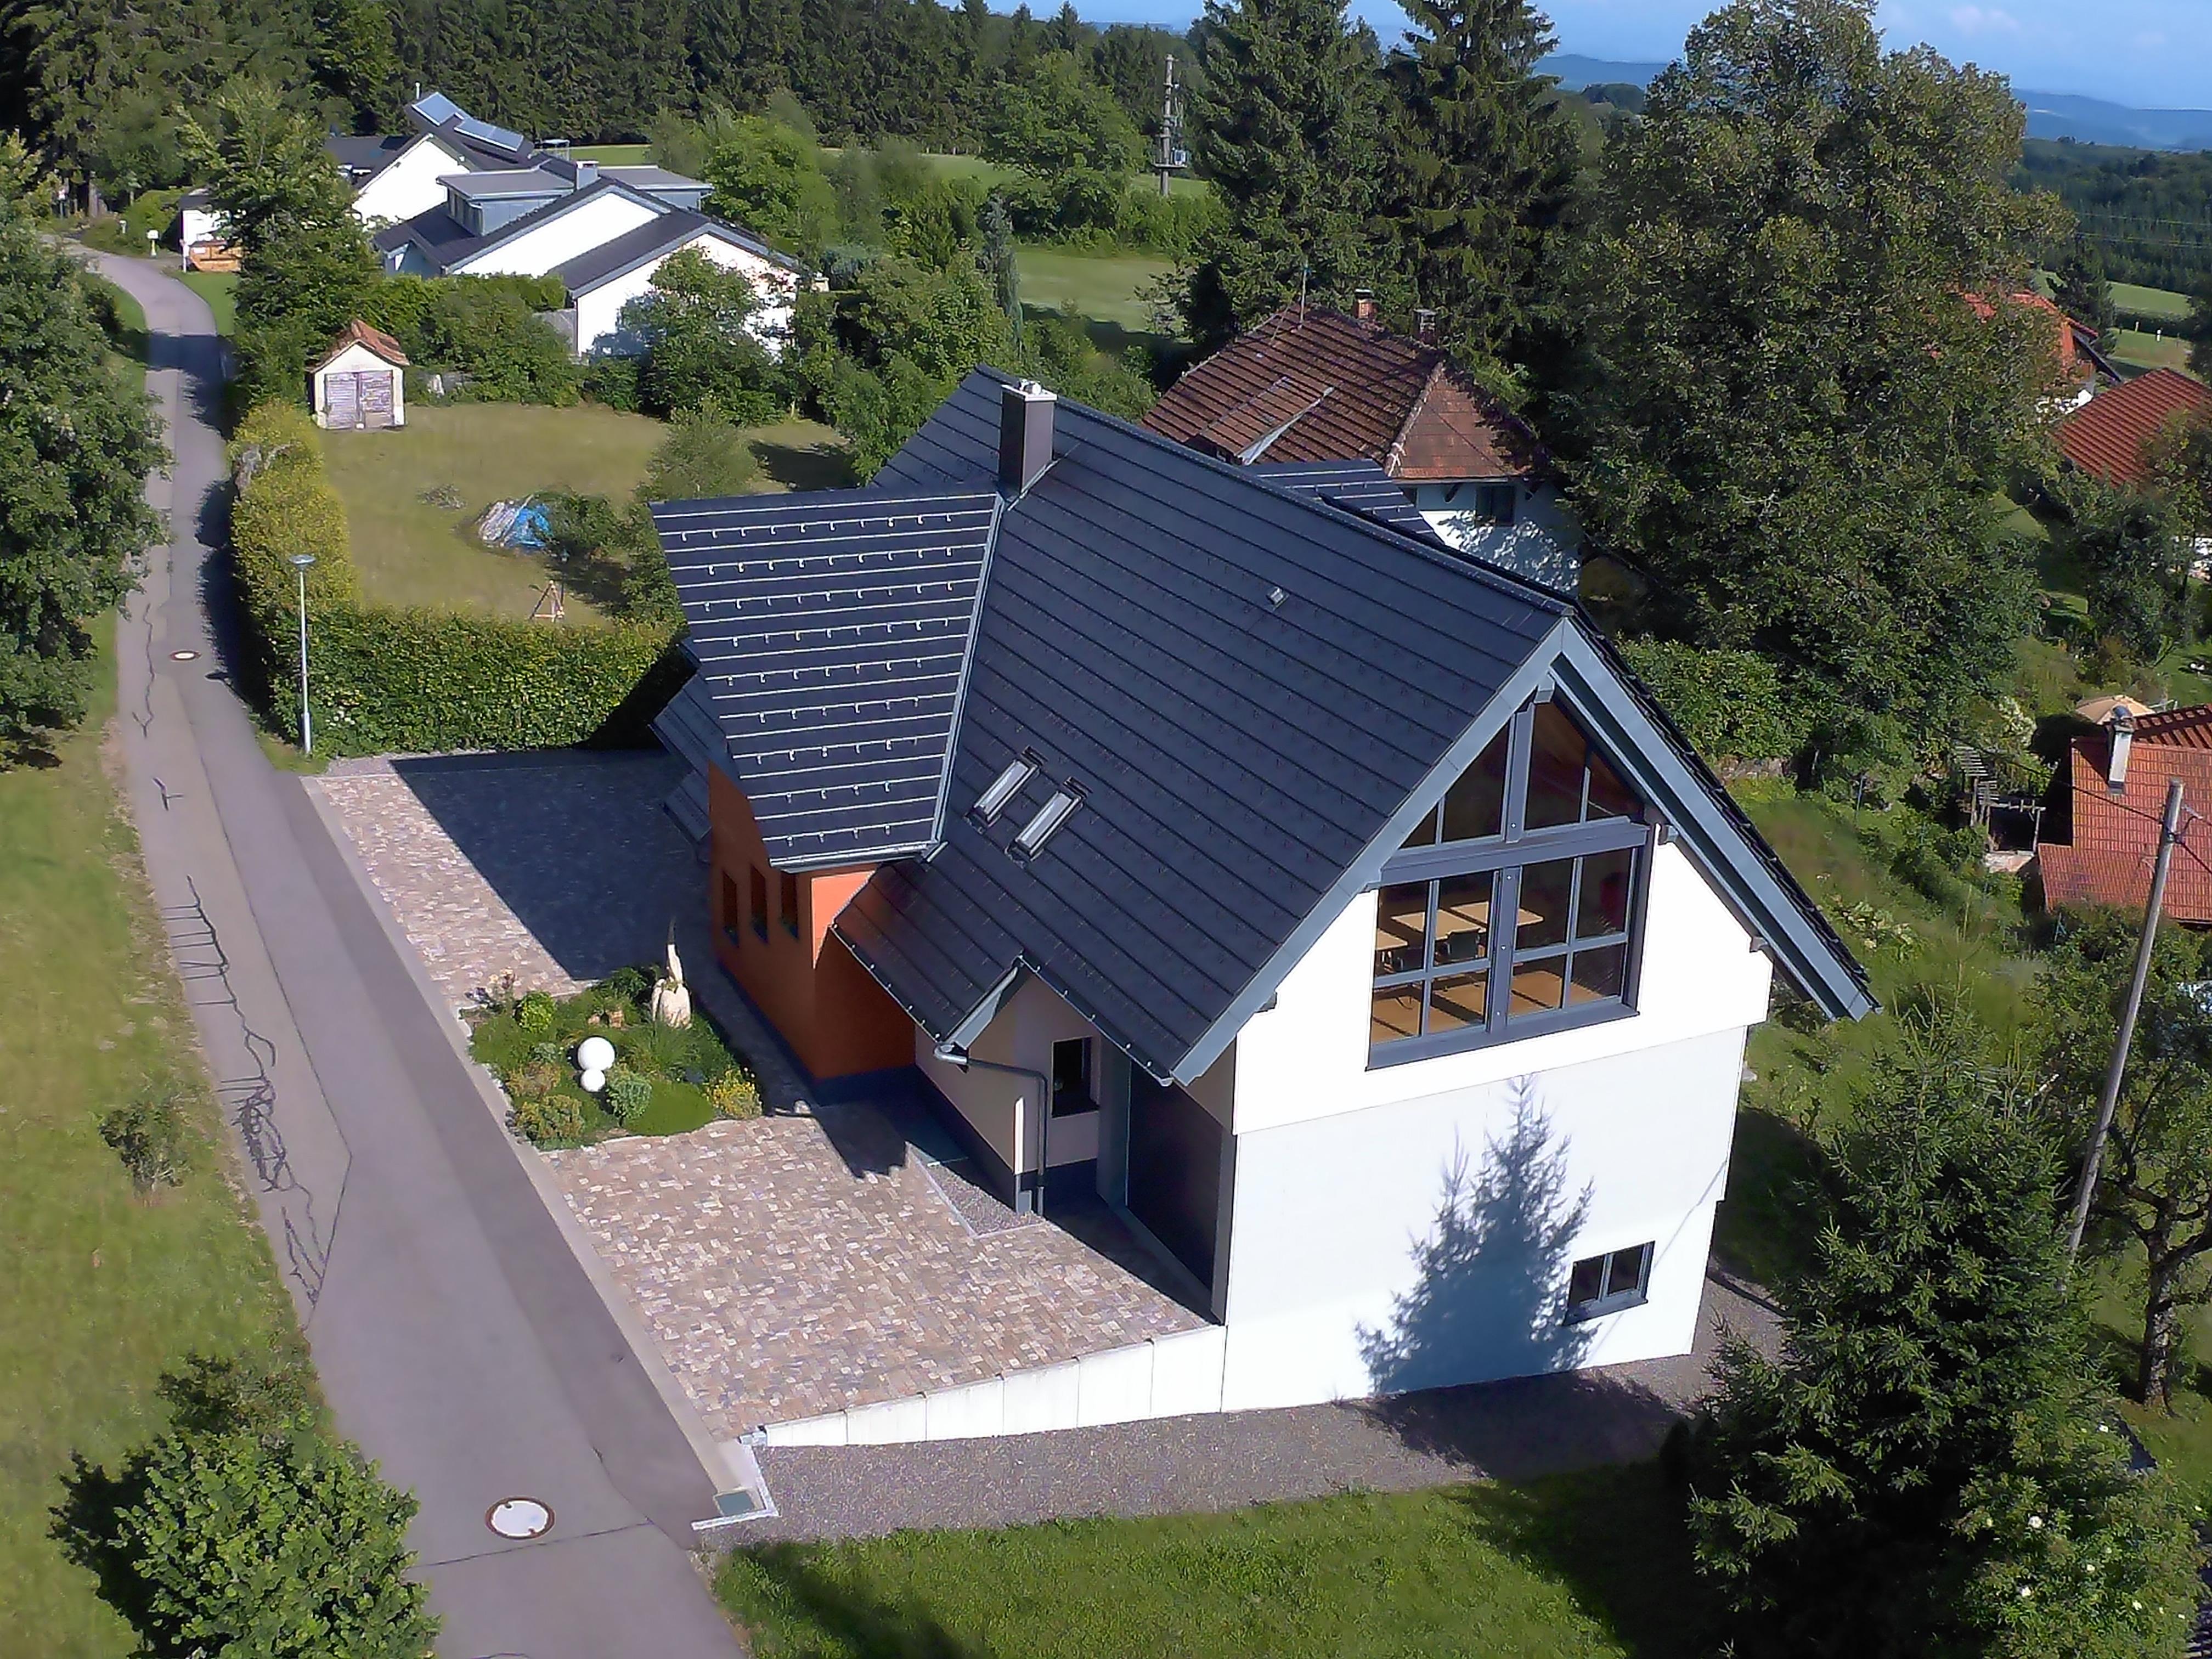 Fotoaufnahmen Luftaufnahmen eines Hauses